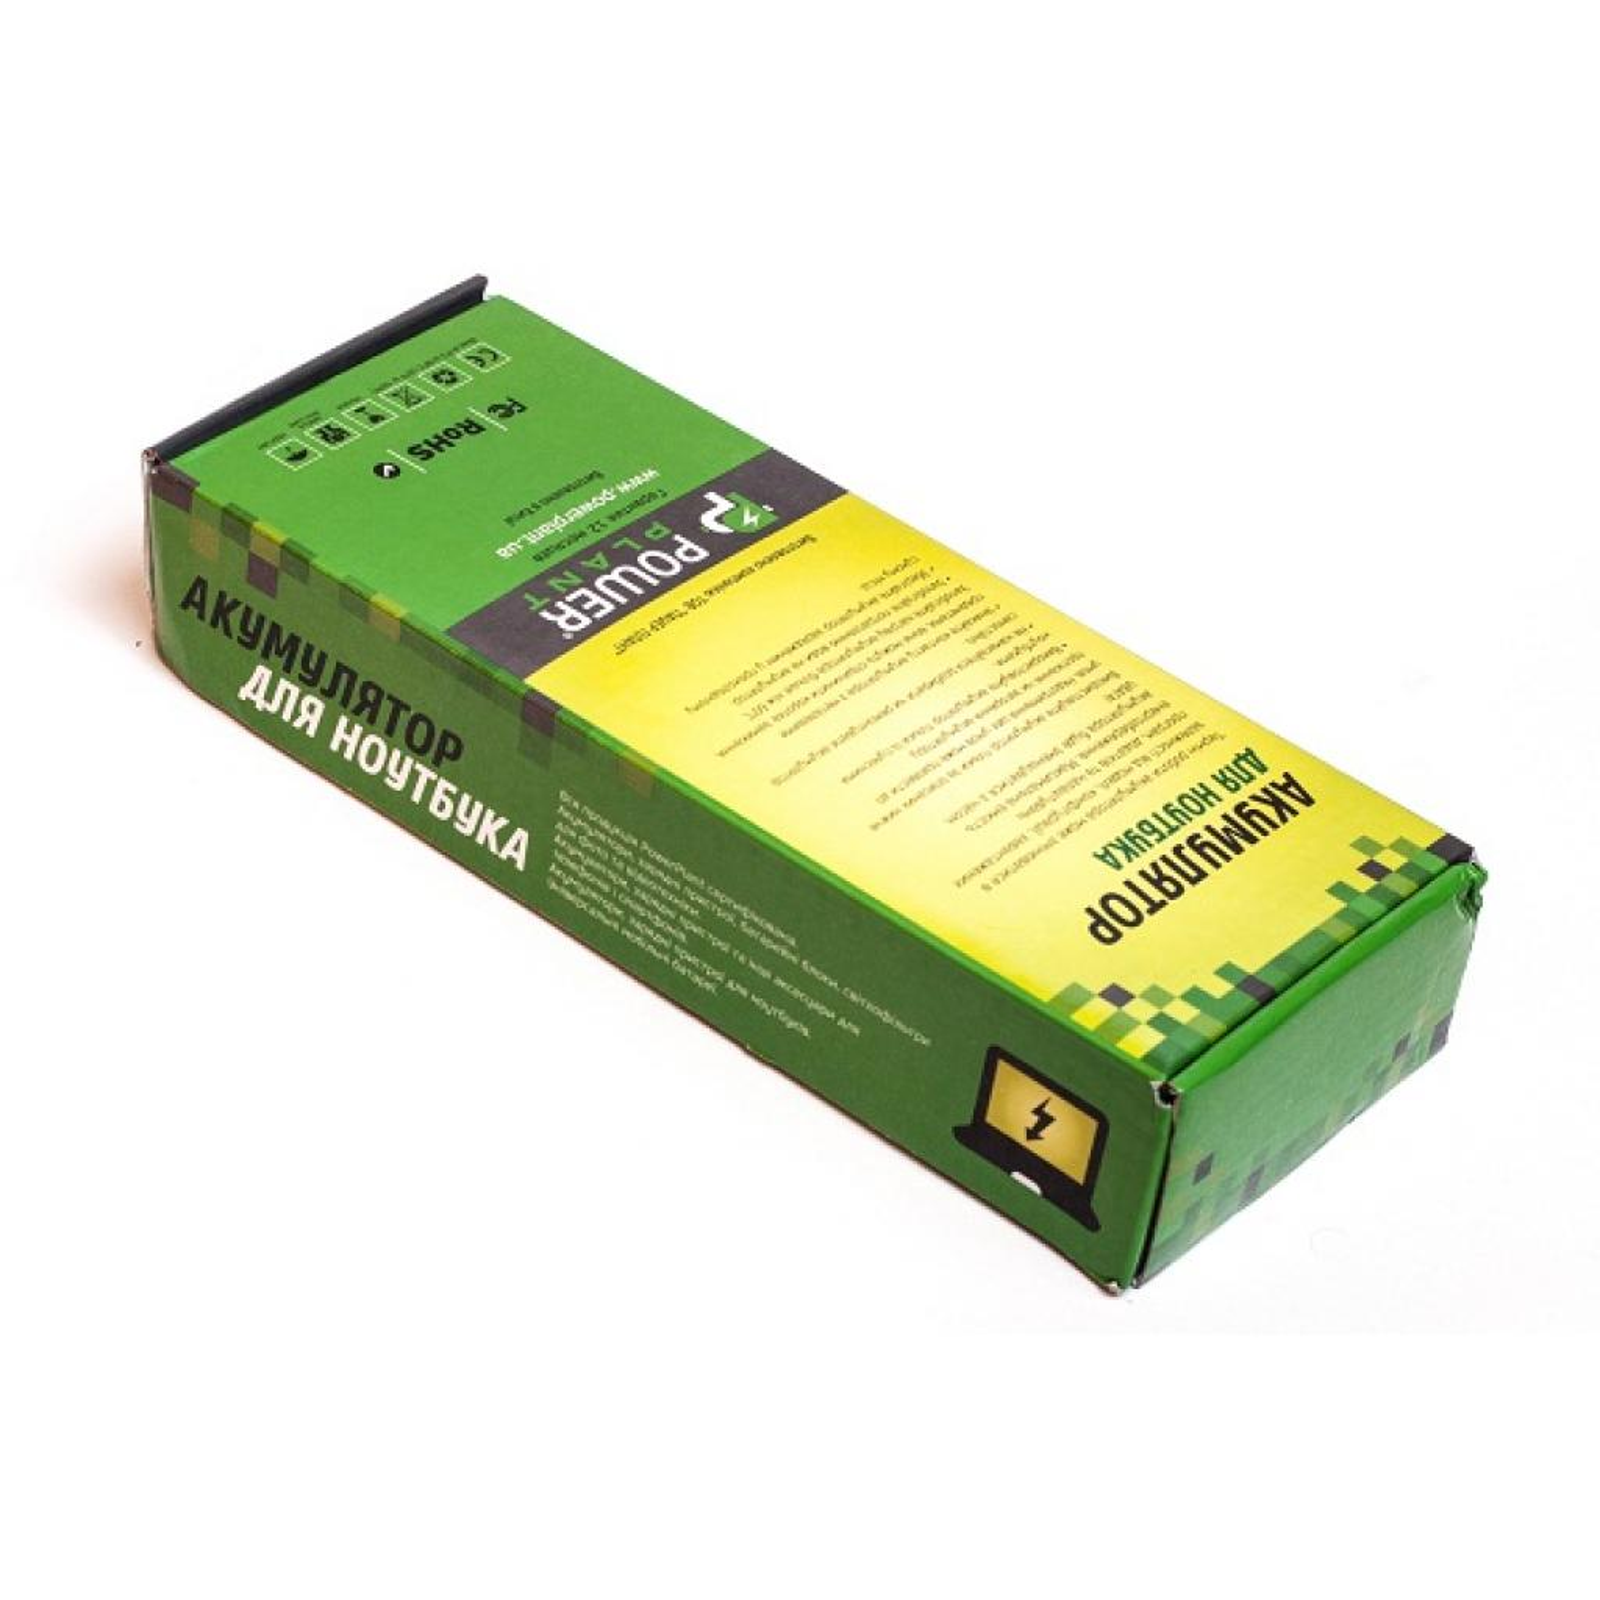 Аккумулятор для ноутбука SONY VAIO VPC-EA1 (VGP-BPS22) 11,1V 5200mAh PowerPlant (NB00000036) изображение 2